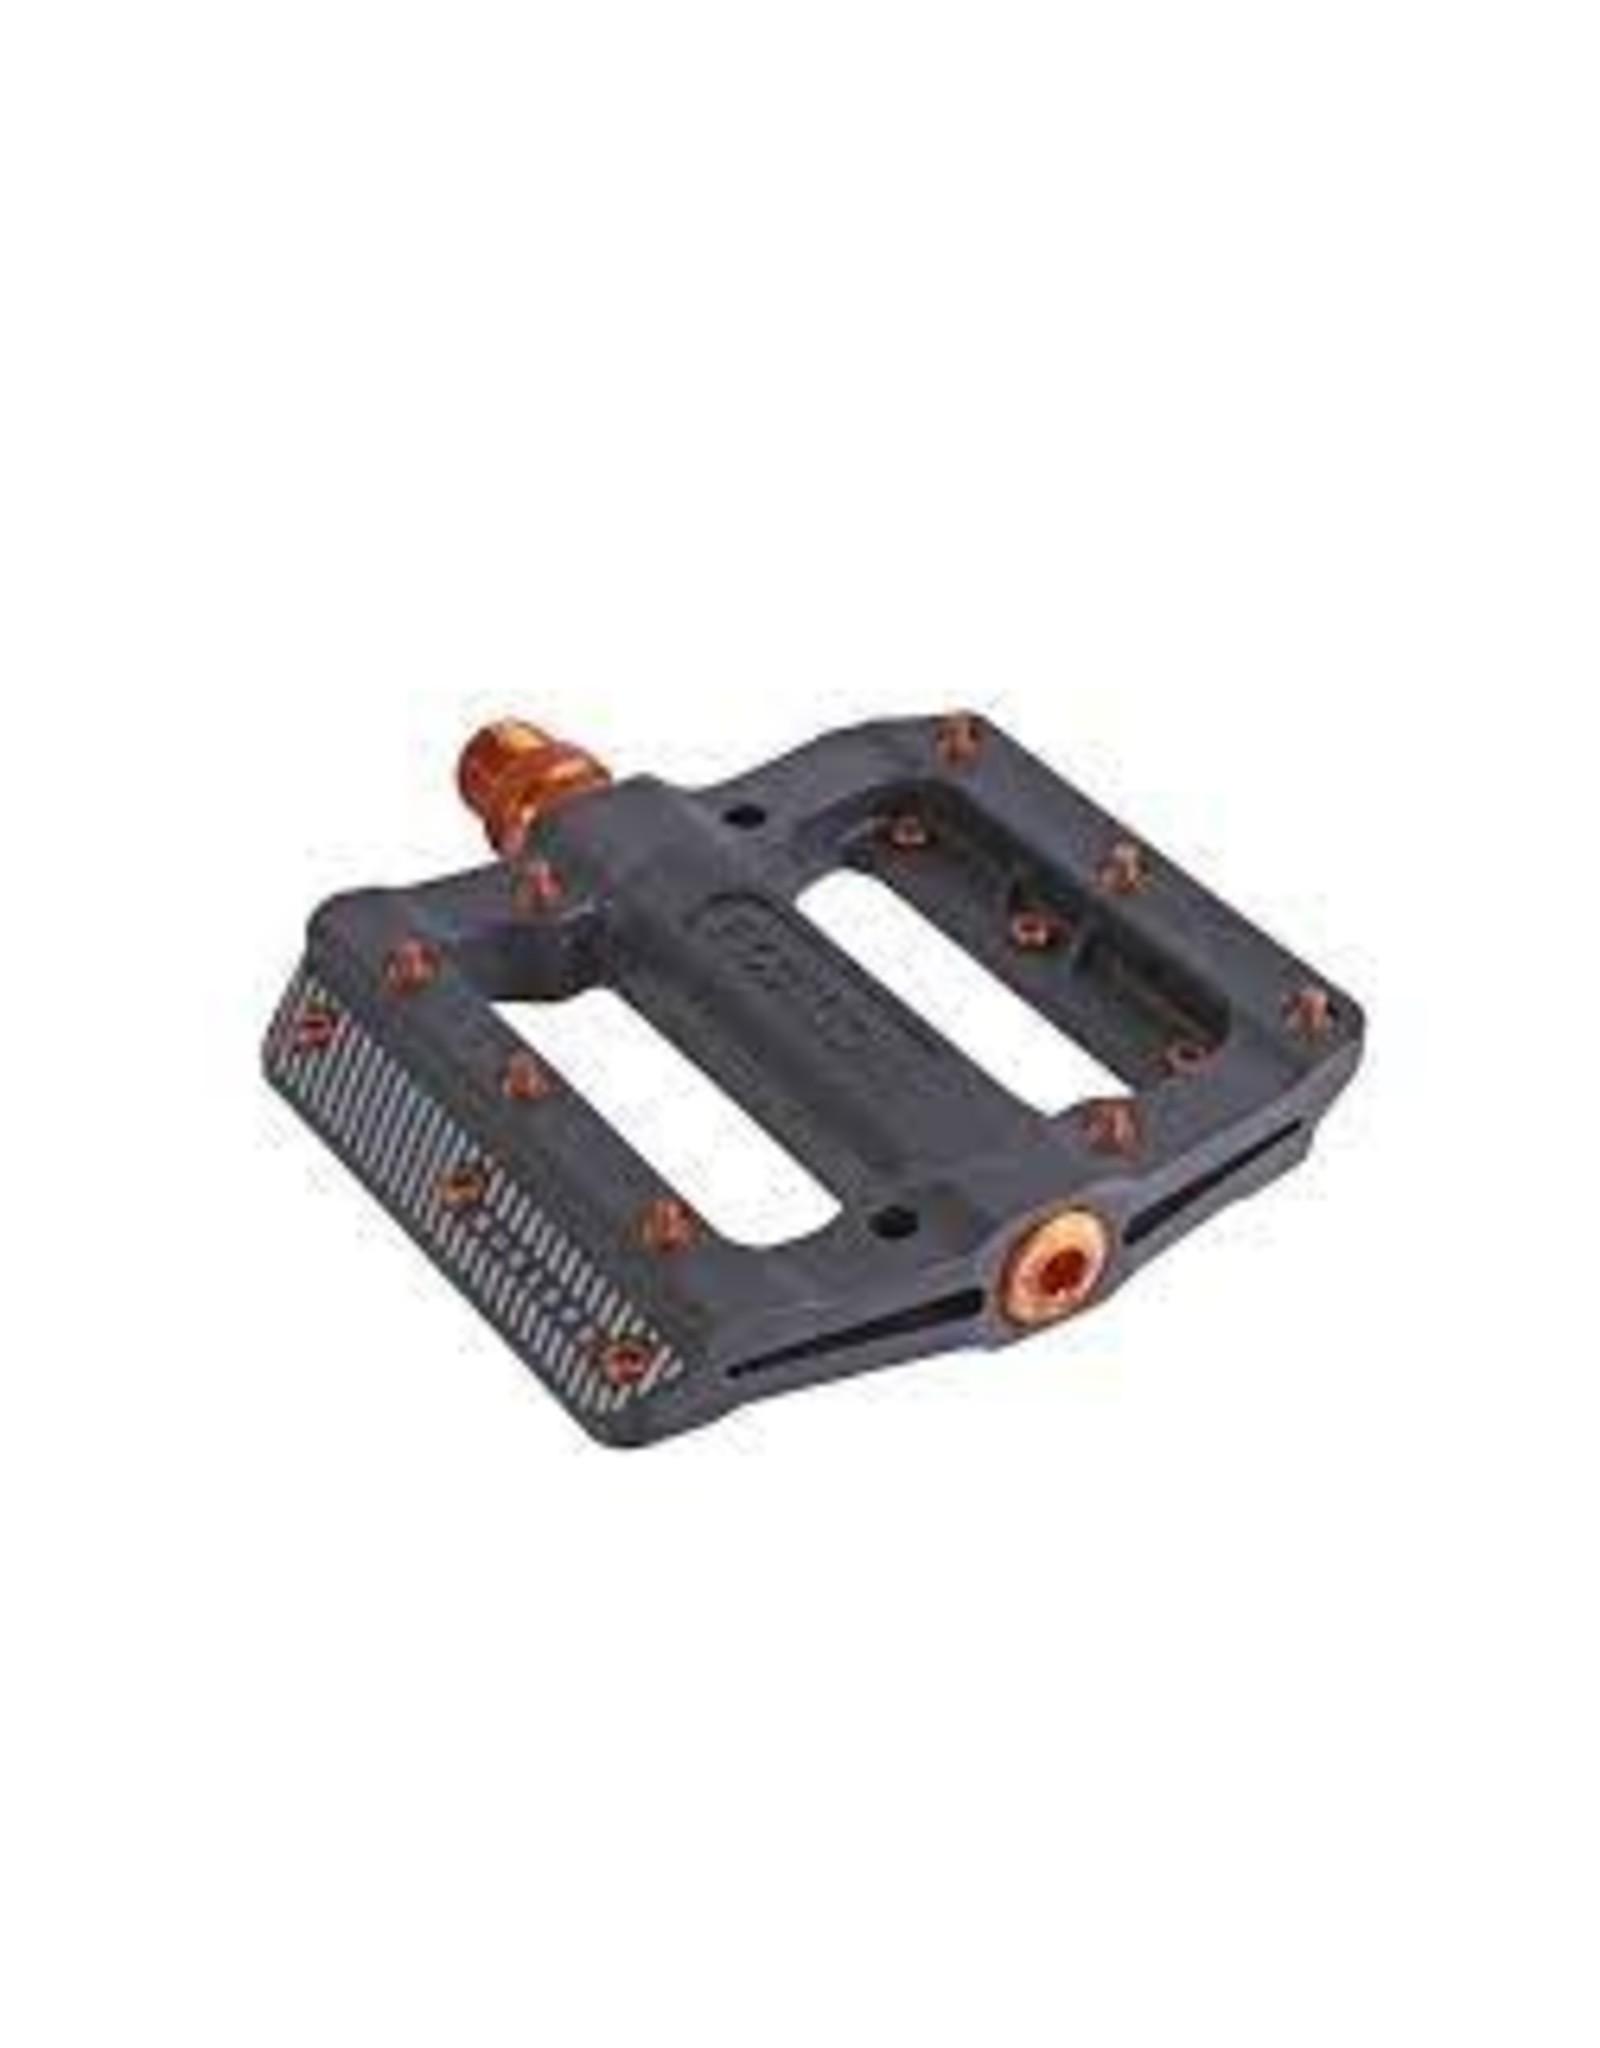 "Fyxation Fyxation Mesa MP Subzero Pedals - Platform, Composite/Plastic, 9/16"", Black/Orange"